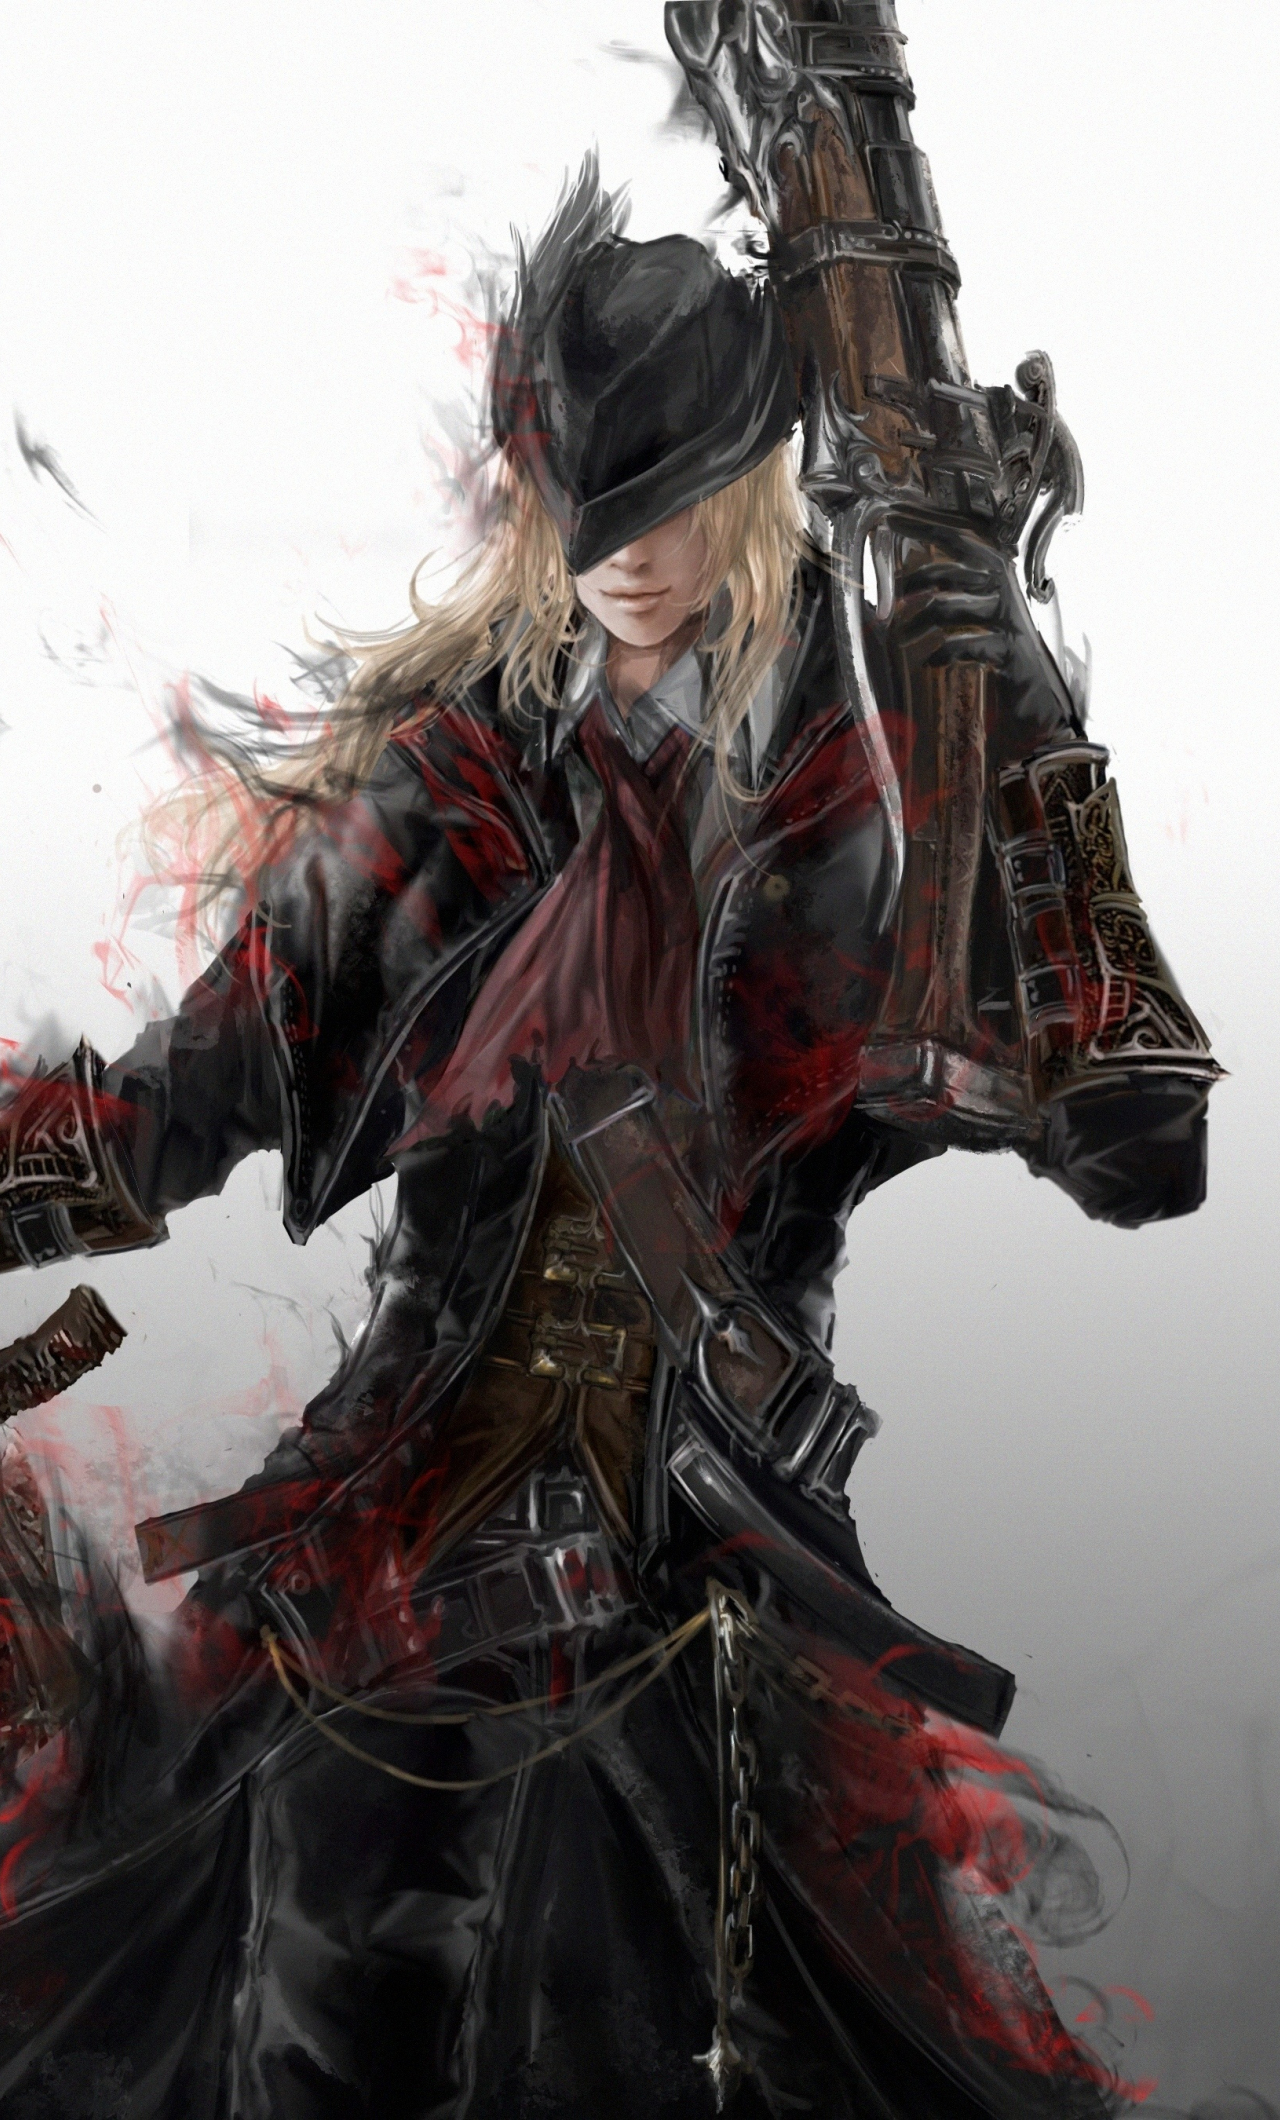 12+ Bloodborne Phone Wallpaper Hd - Bizt Wallpaper